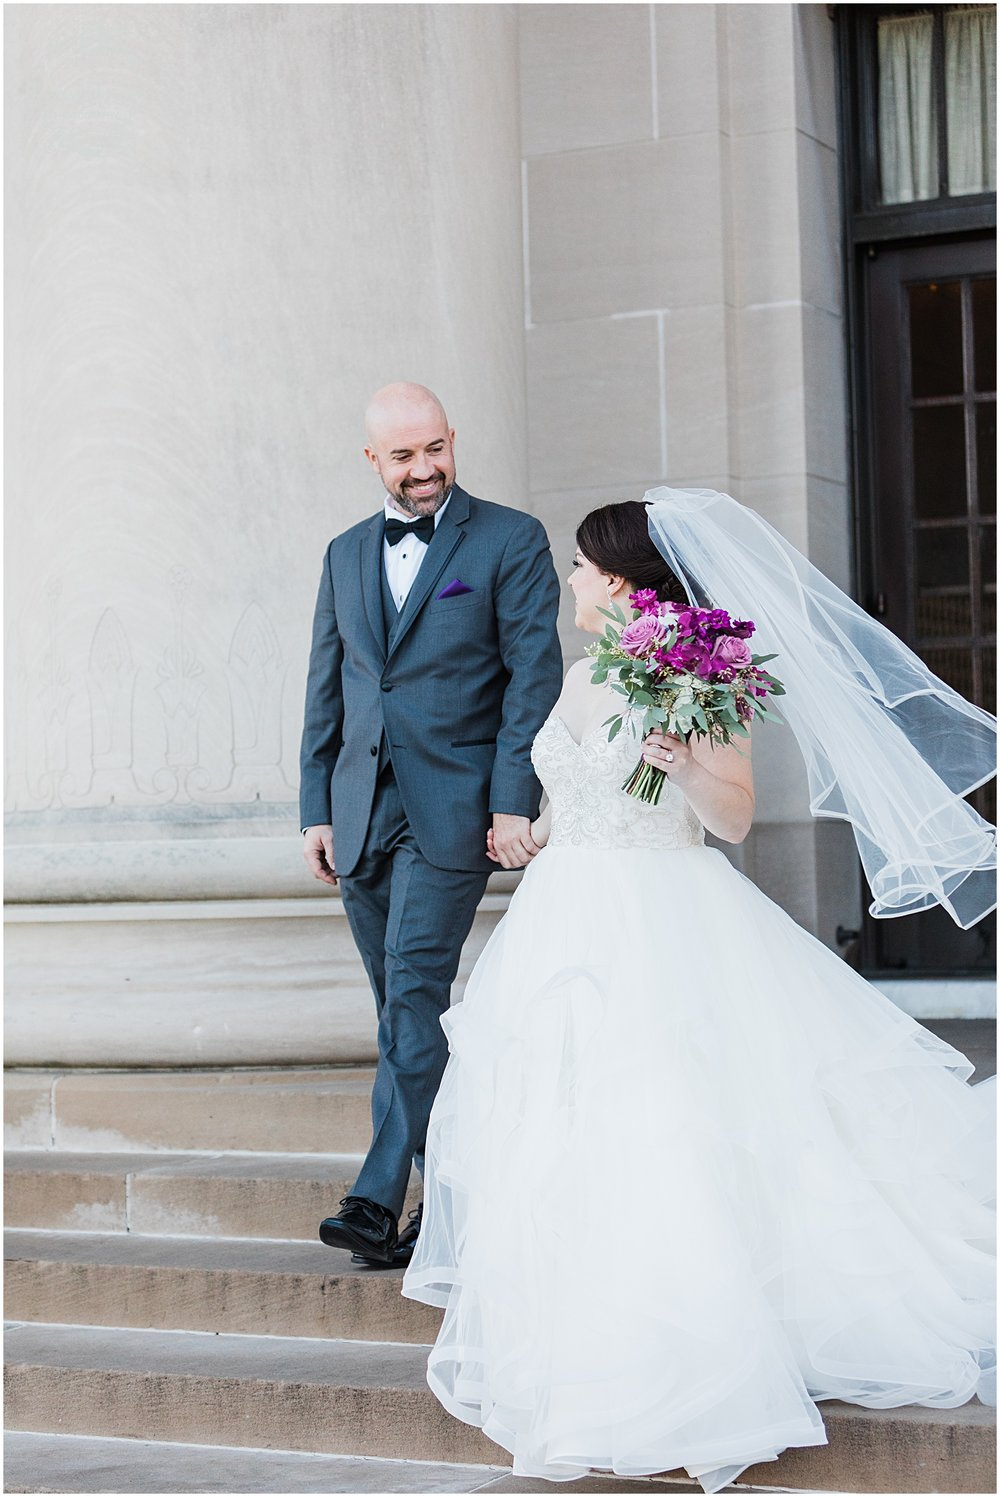 LAURA & DAN MARRIED | NELSON ATKINS MUSEUM | MARISSA CRIBBS PHOTOGRAPHY_7003.jpg